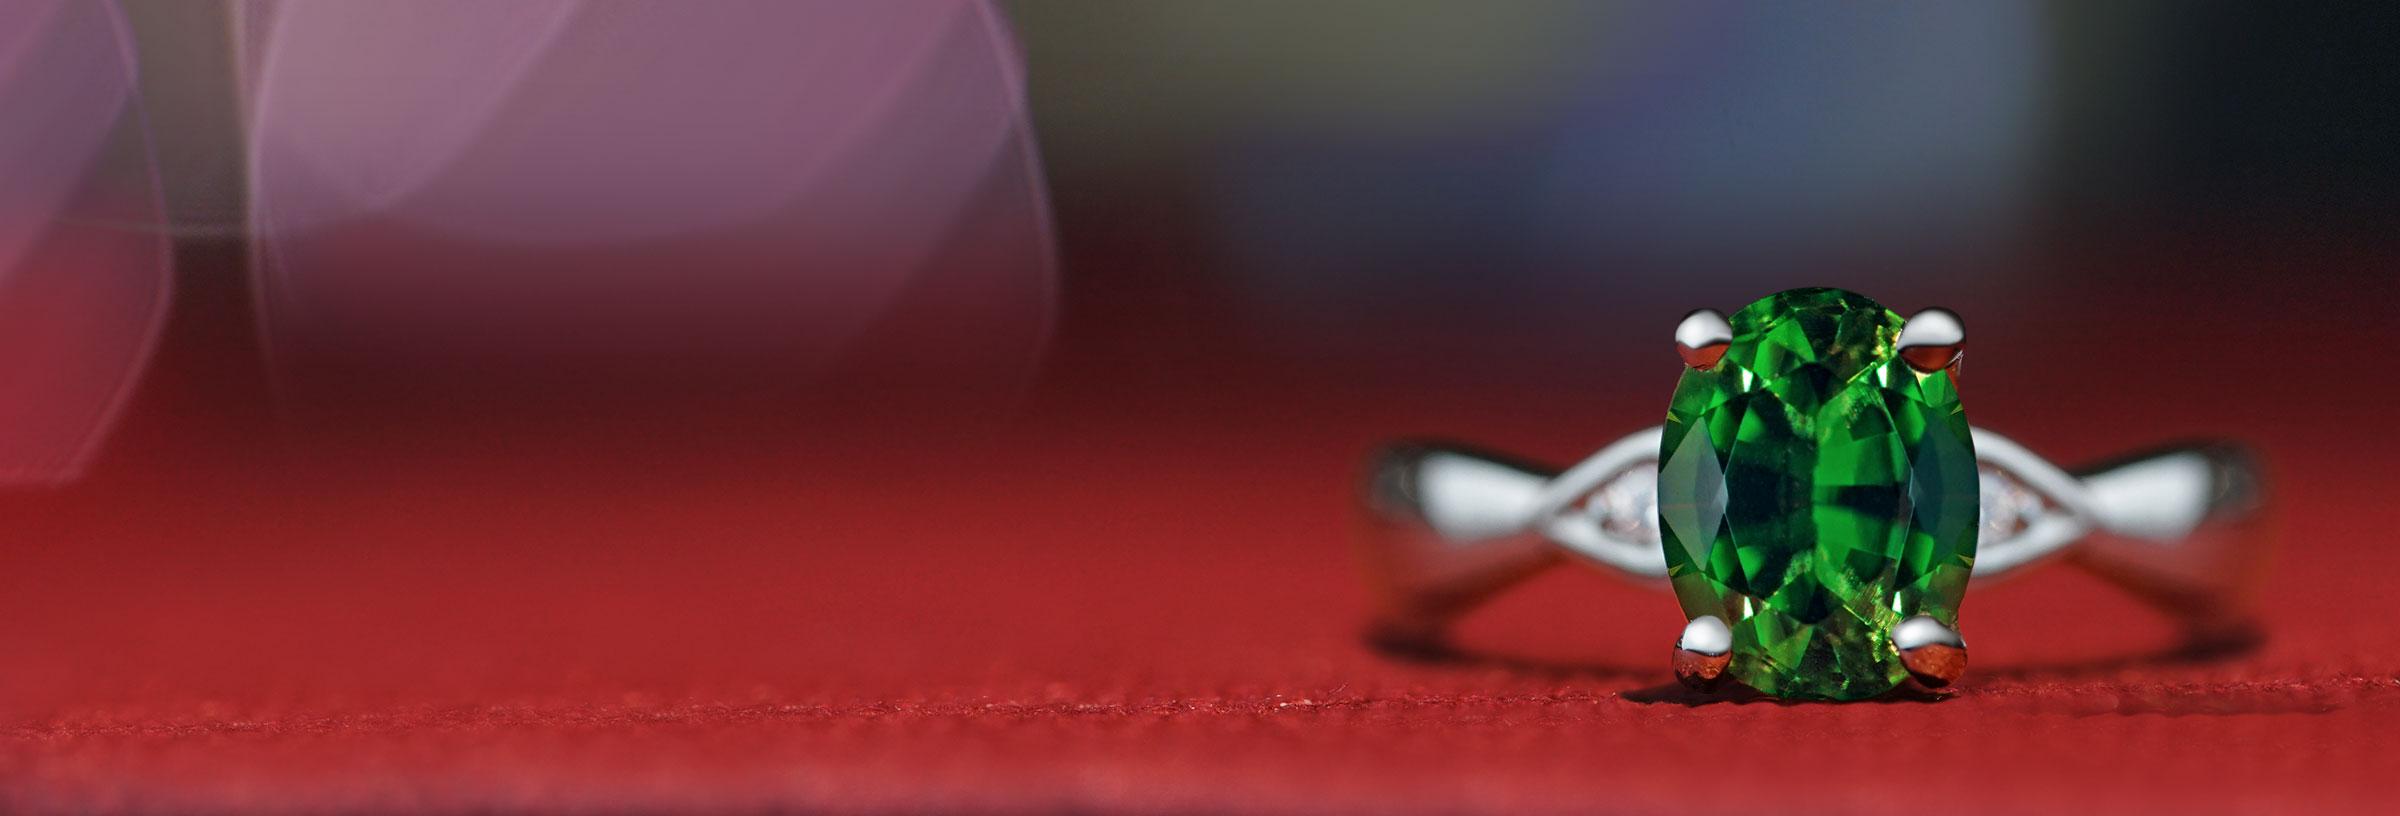 Palladium, 0.91ct oval cut tourmaline and 0.03ct diamond engagement ring